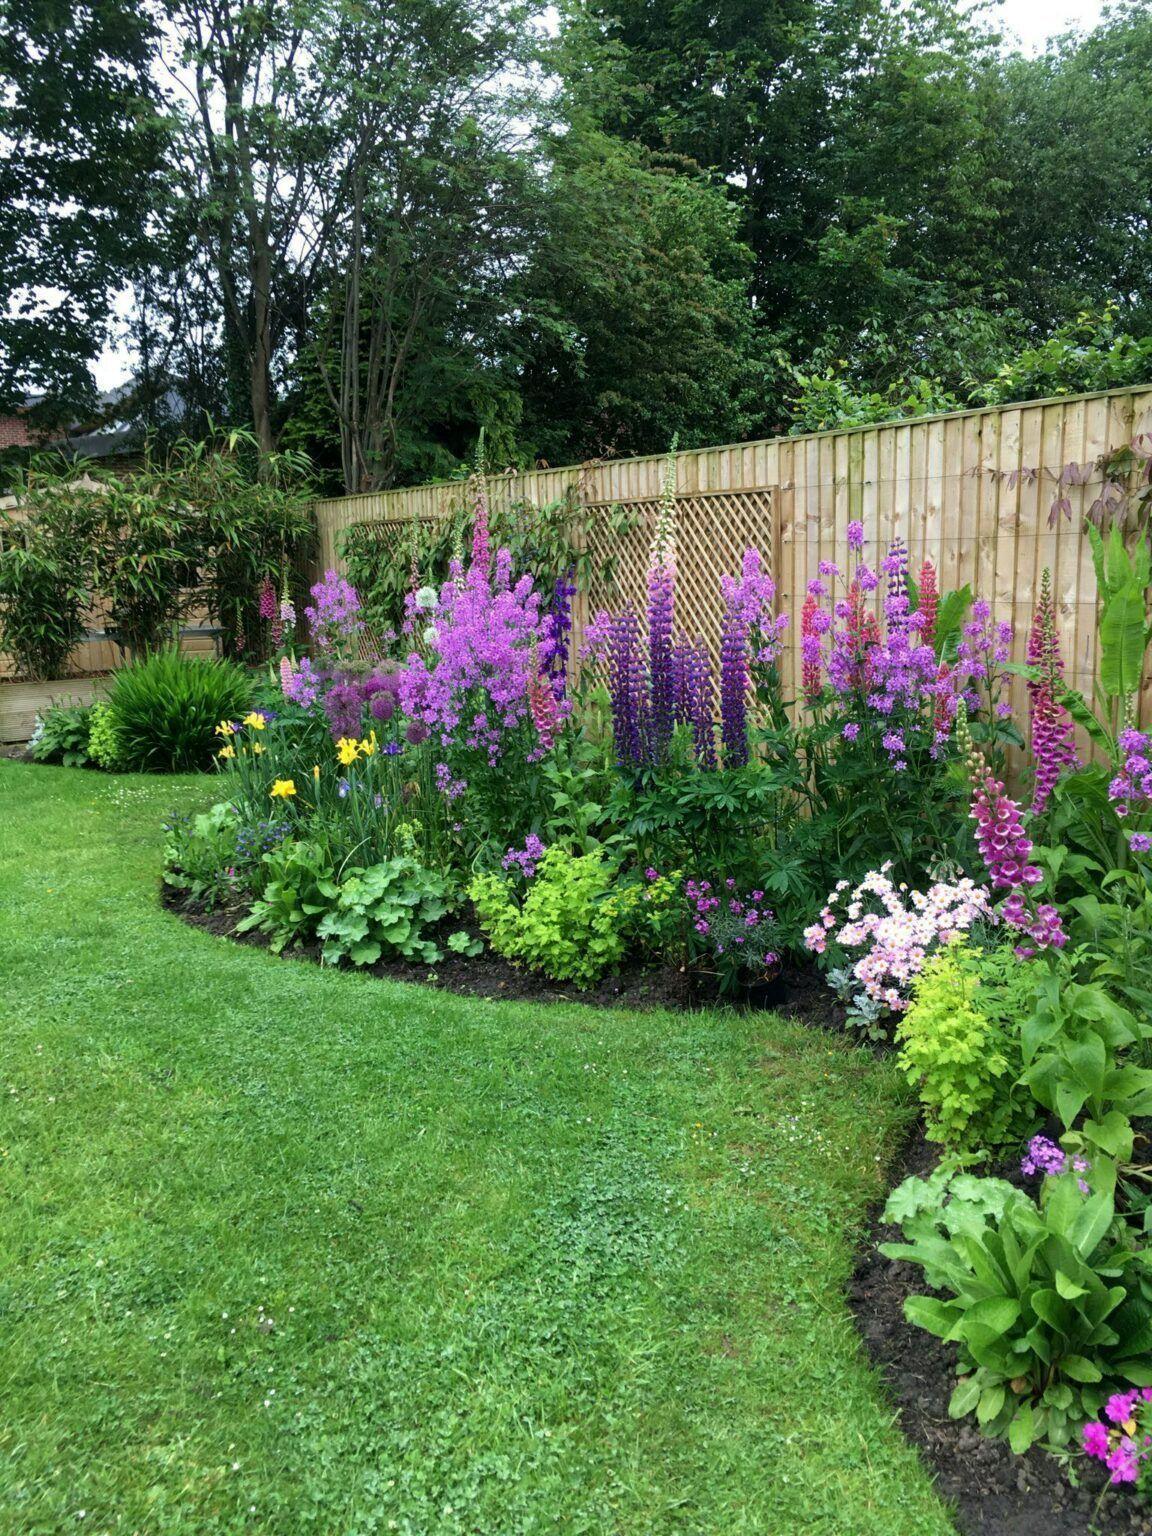 81 Beliebtesten Sommer Garten Deko Ideen 24 In 2020 Backyard Landscaping Designs English Garden Design Backyard Landscaping